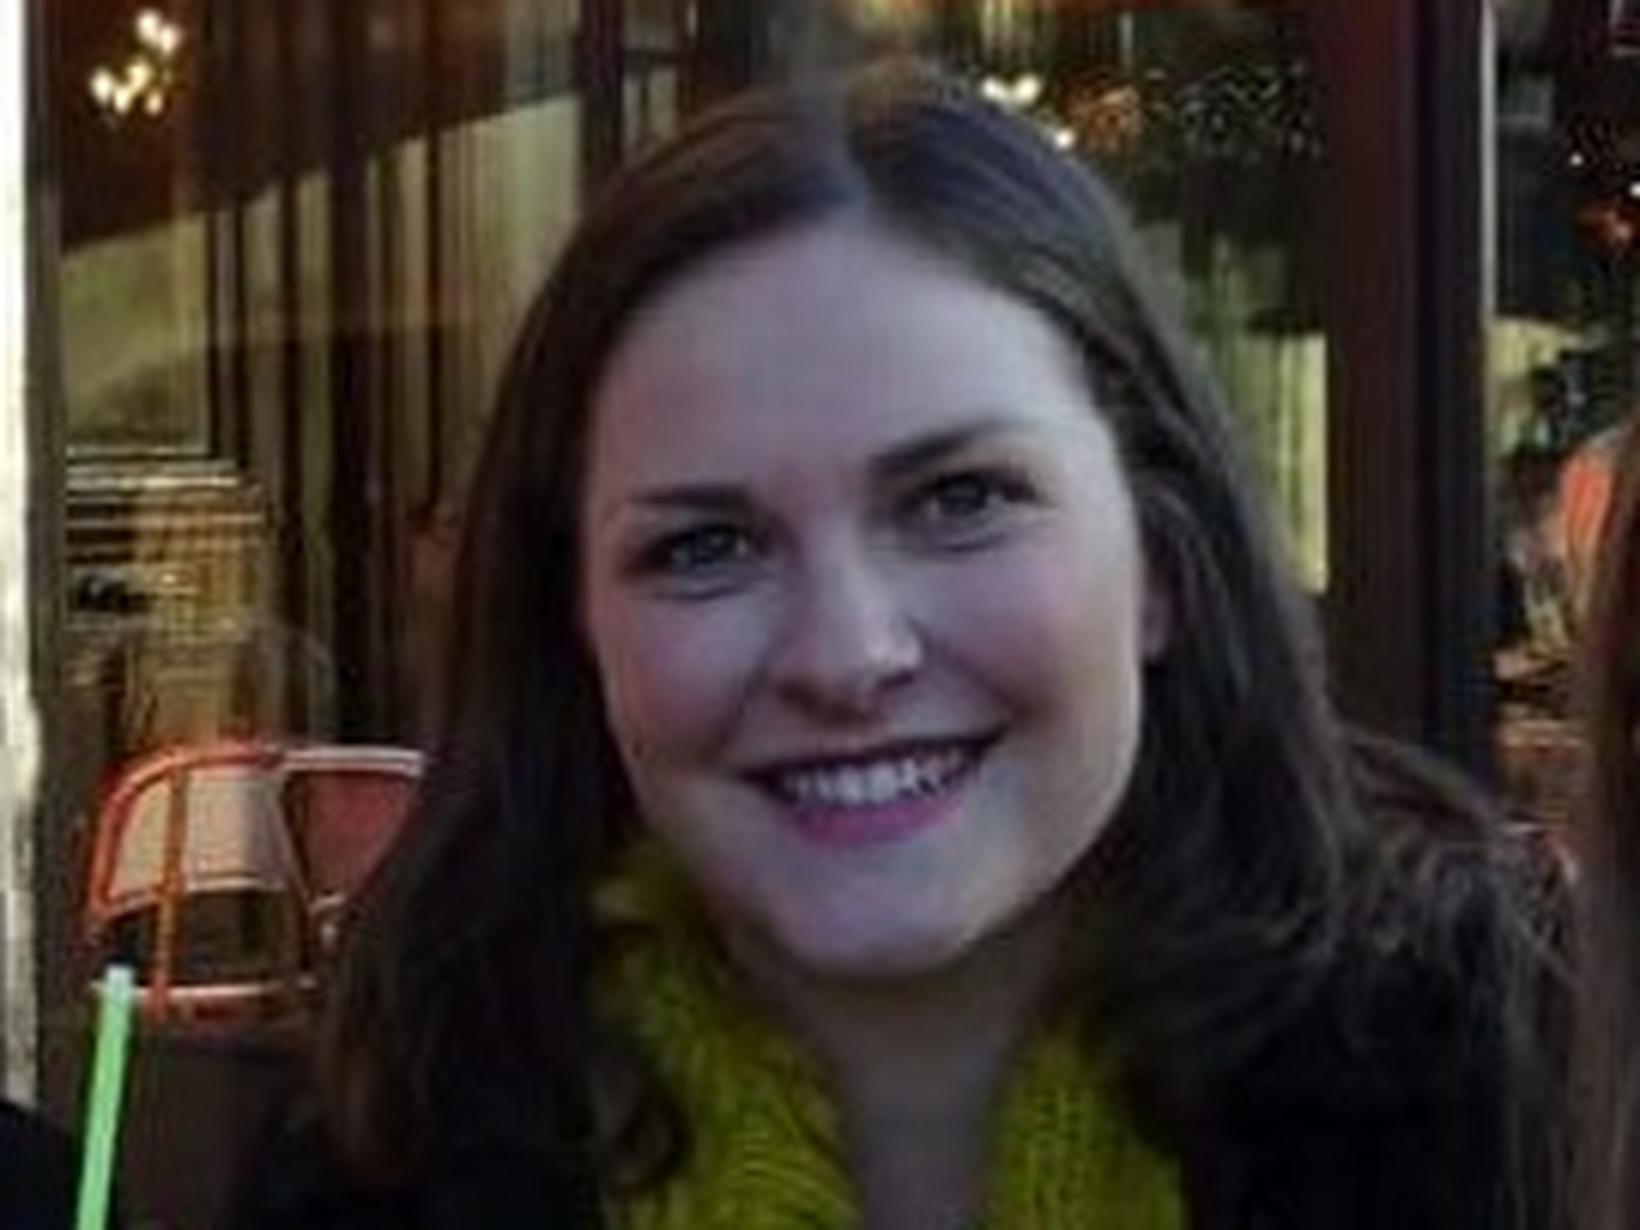 Megantuckwell@live.com.au from London, United Kingdom